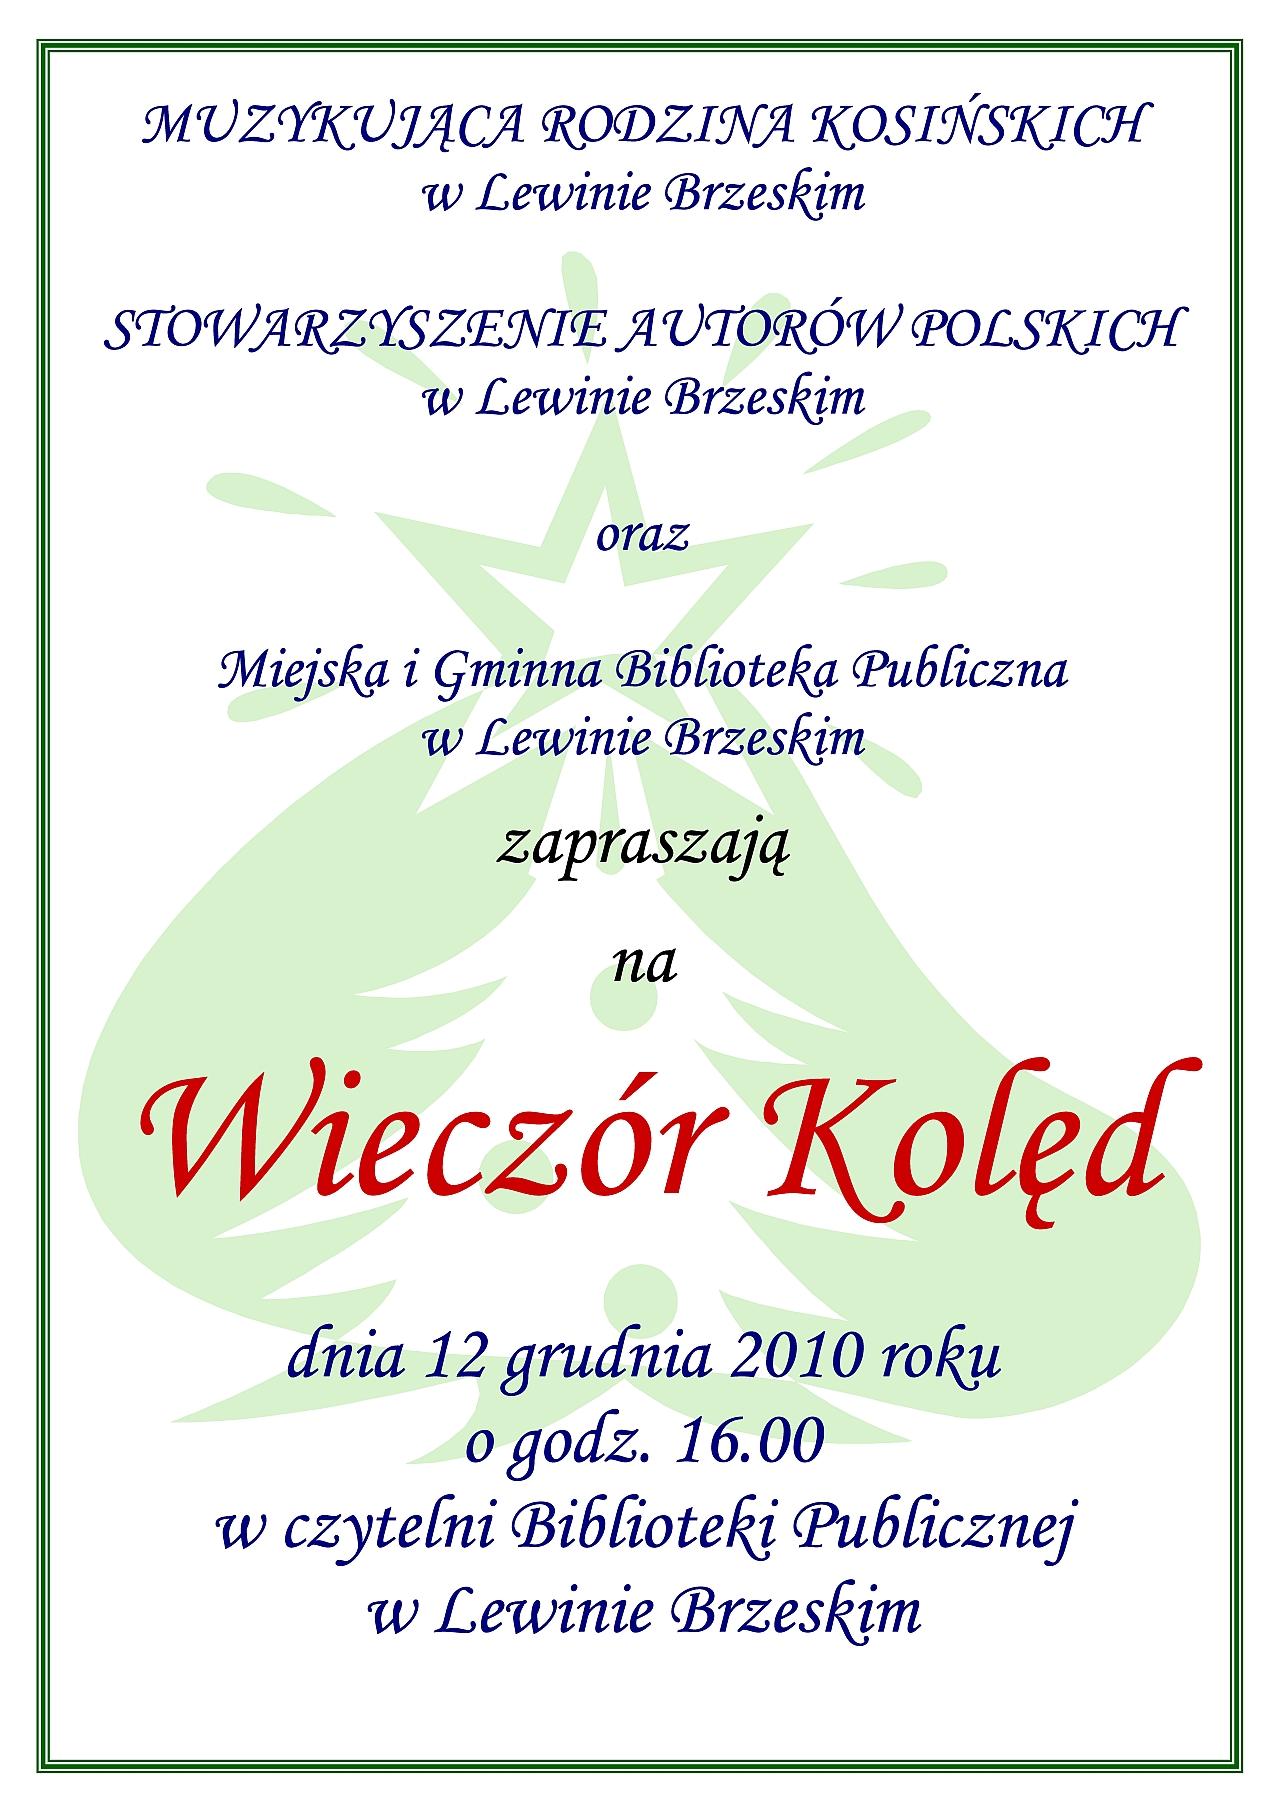 Wieczór Kolęd 2010 plakat A3